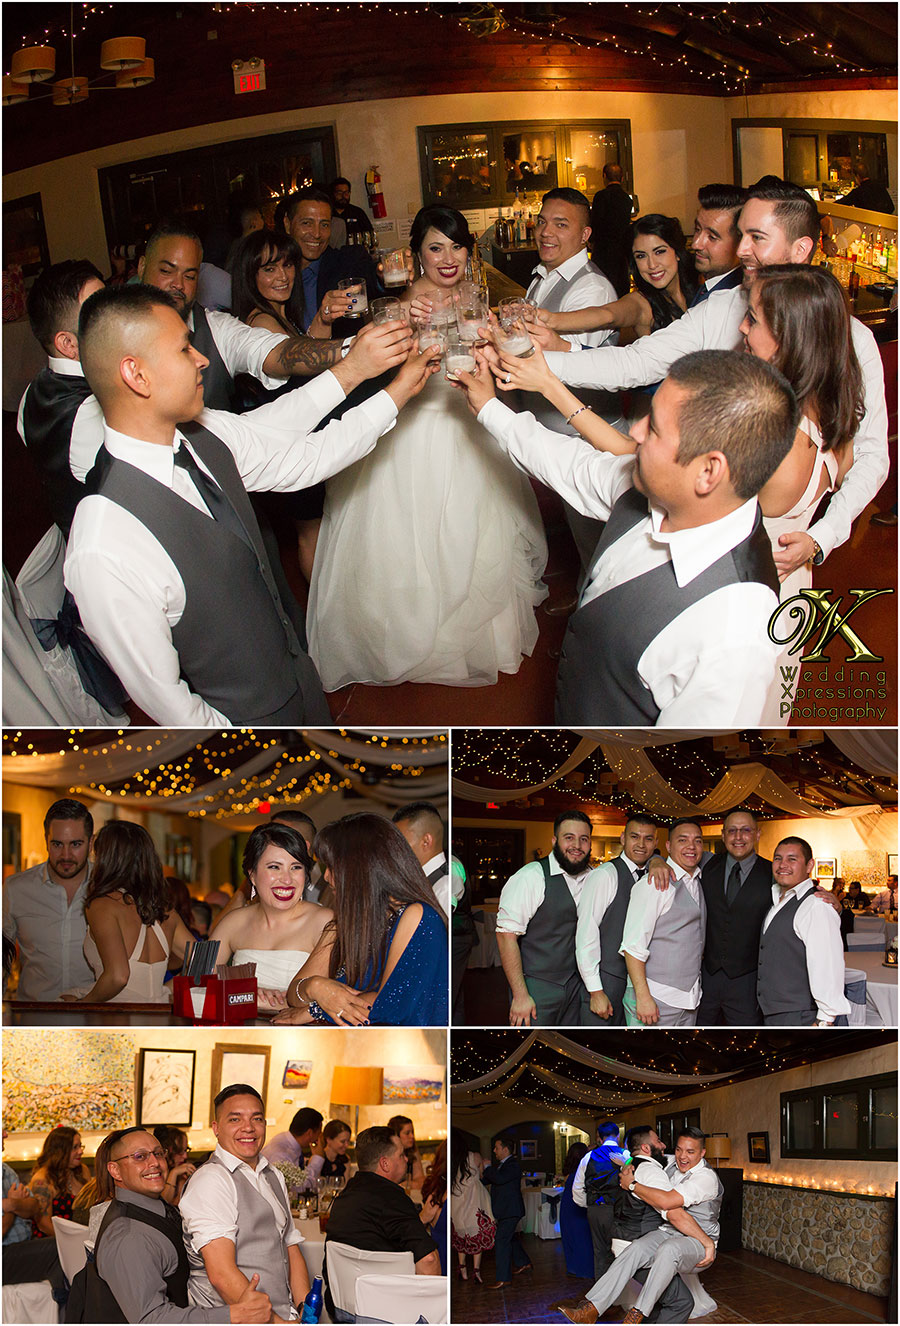 wedding at Ardovino's Desert Crossing